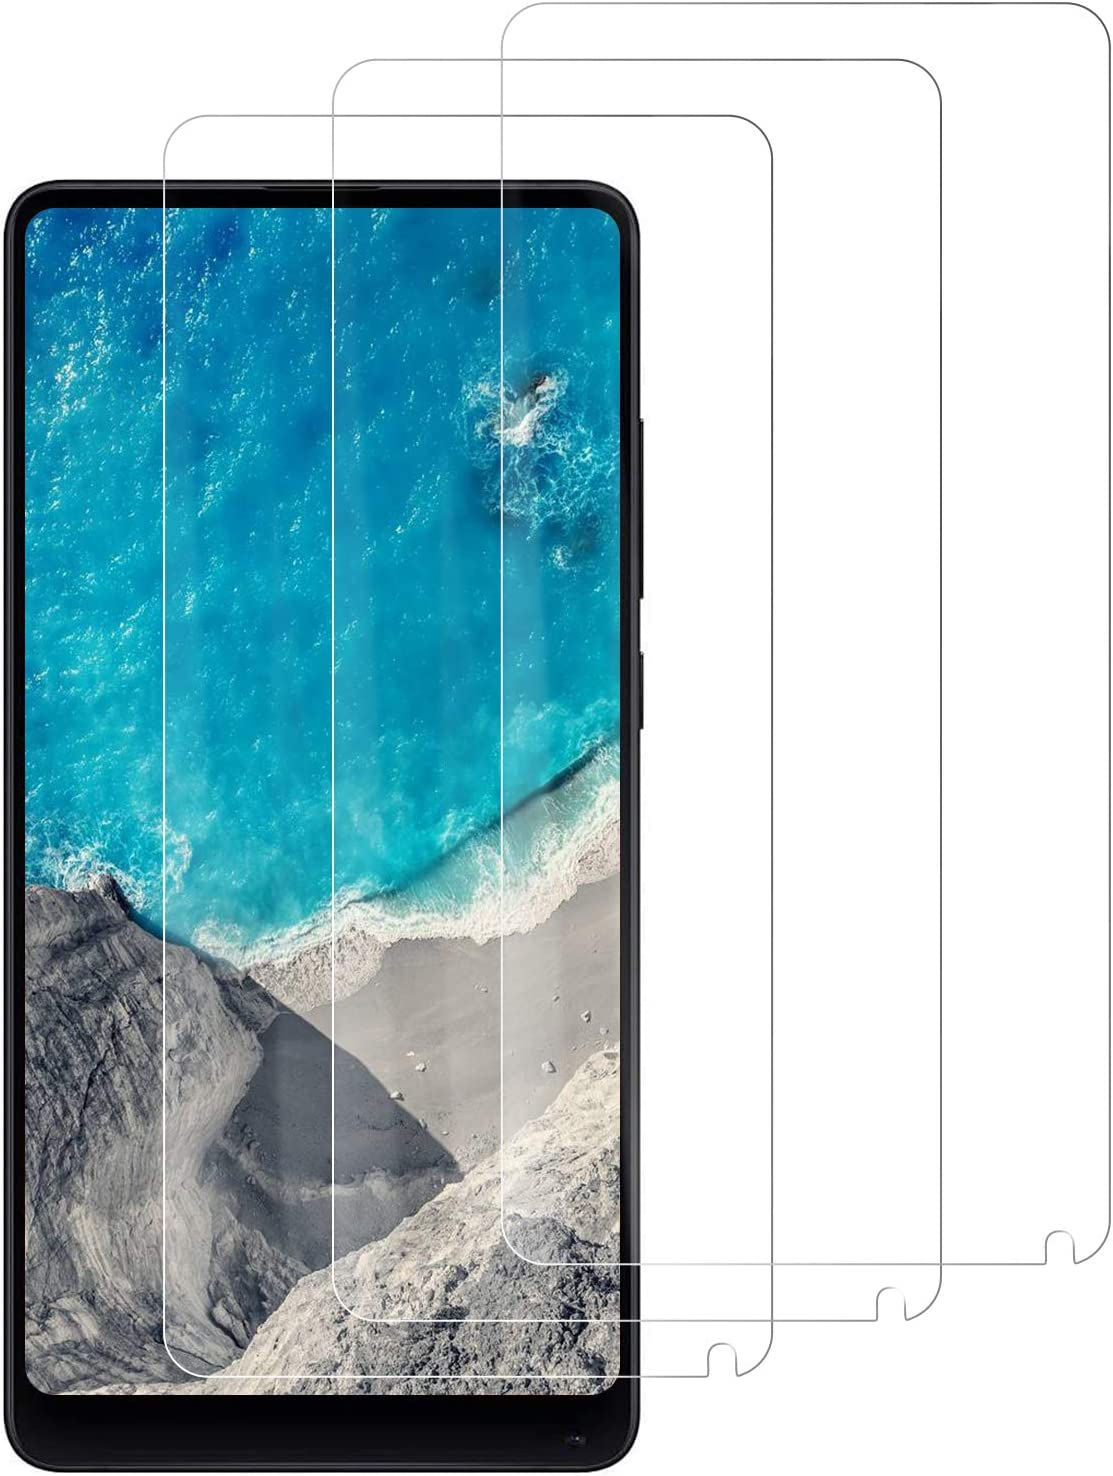 PUUDUU Protector de Pantalla para Xiaomi Mi Mix 2, [3 Pack] Cristal Templado para Xiaomi Mi Mix 2, Vidrio Templado, Sin Burbujas, Anti-Rasguños, HD Transparente